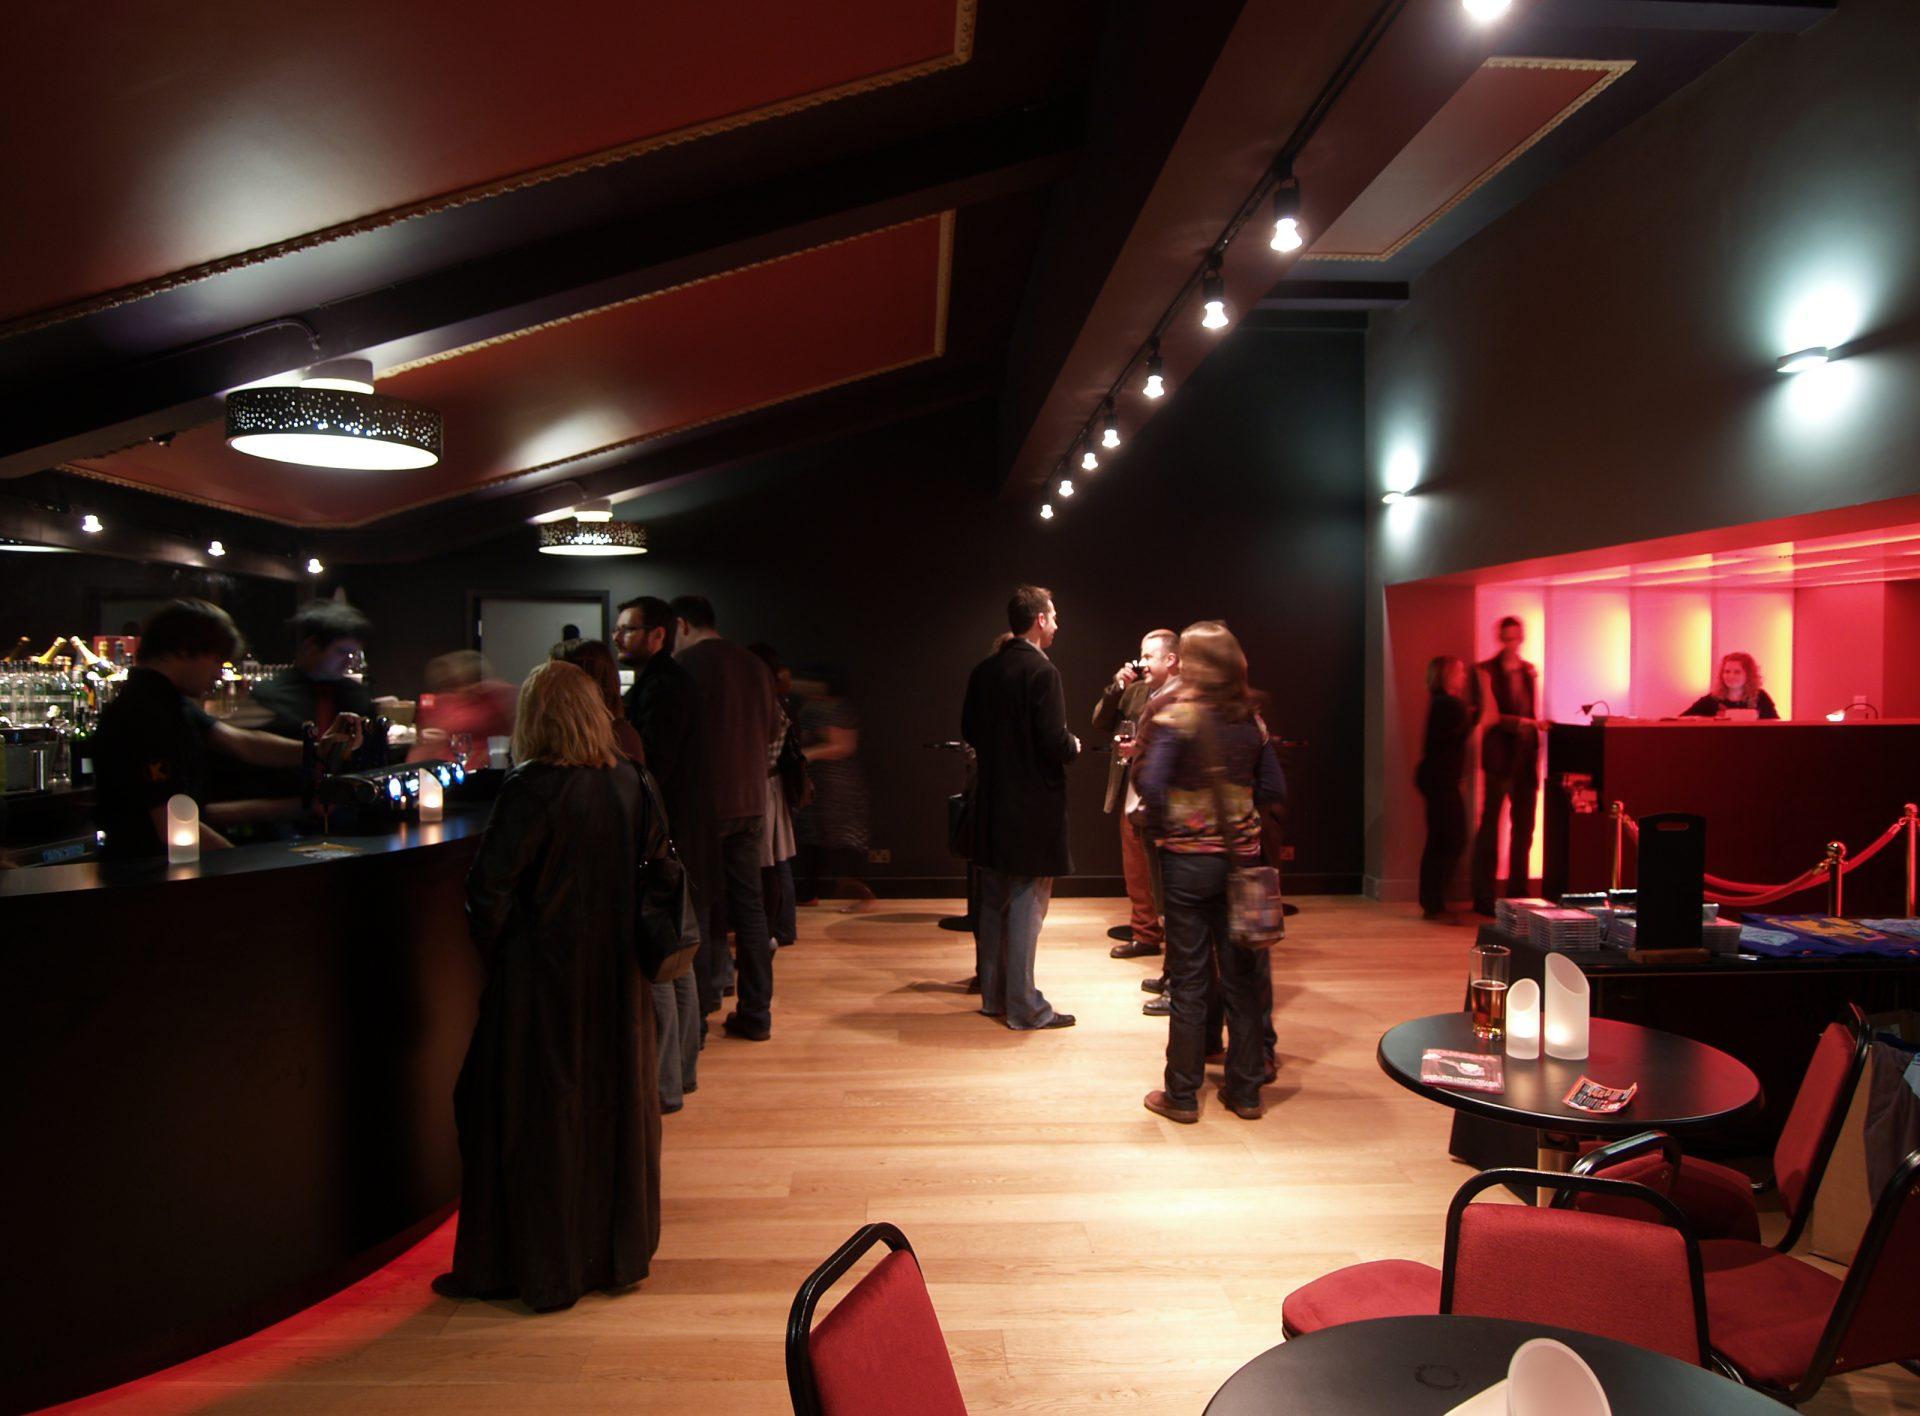 Komedia Bath Comedy Club Cafe Bar Cinema Conversion Light Tunnel Box